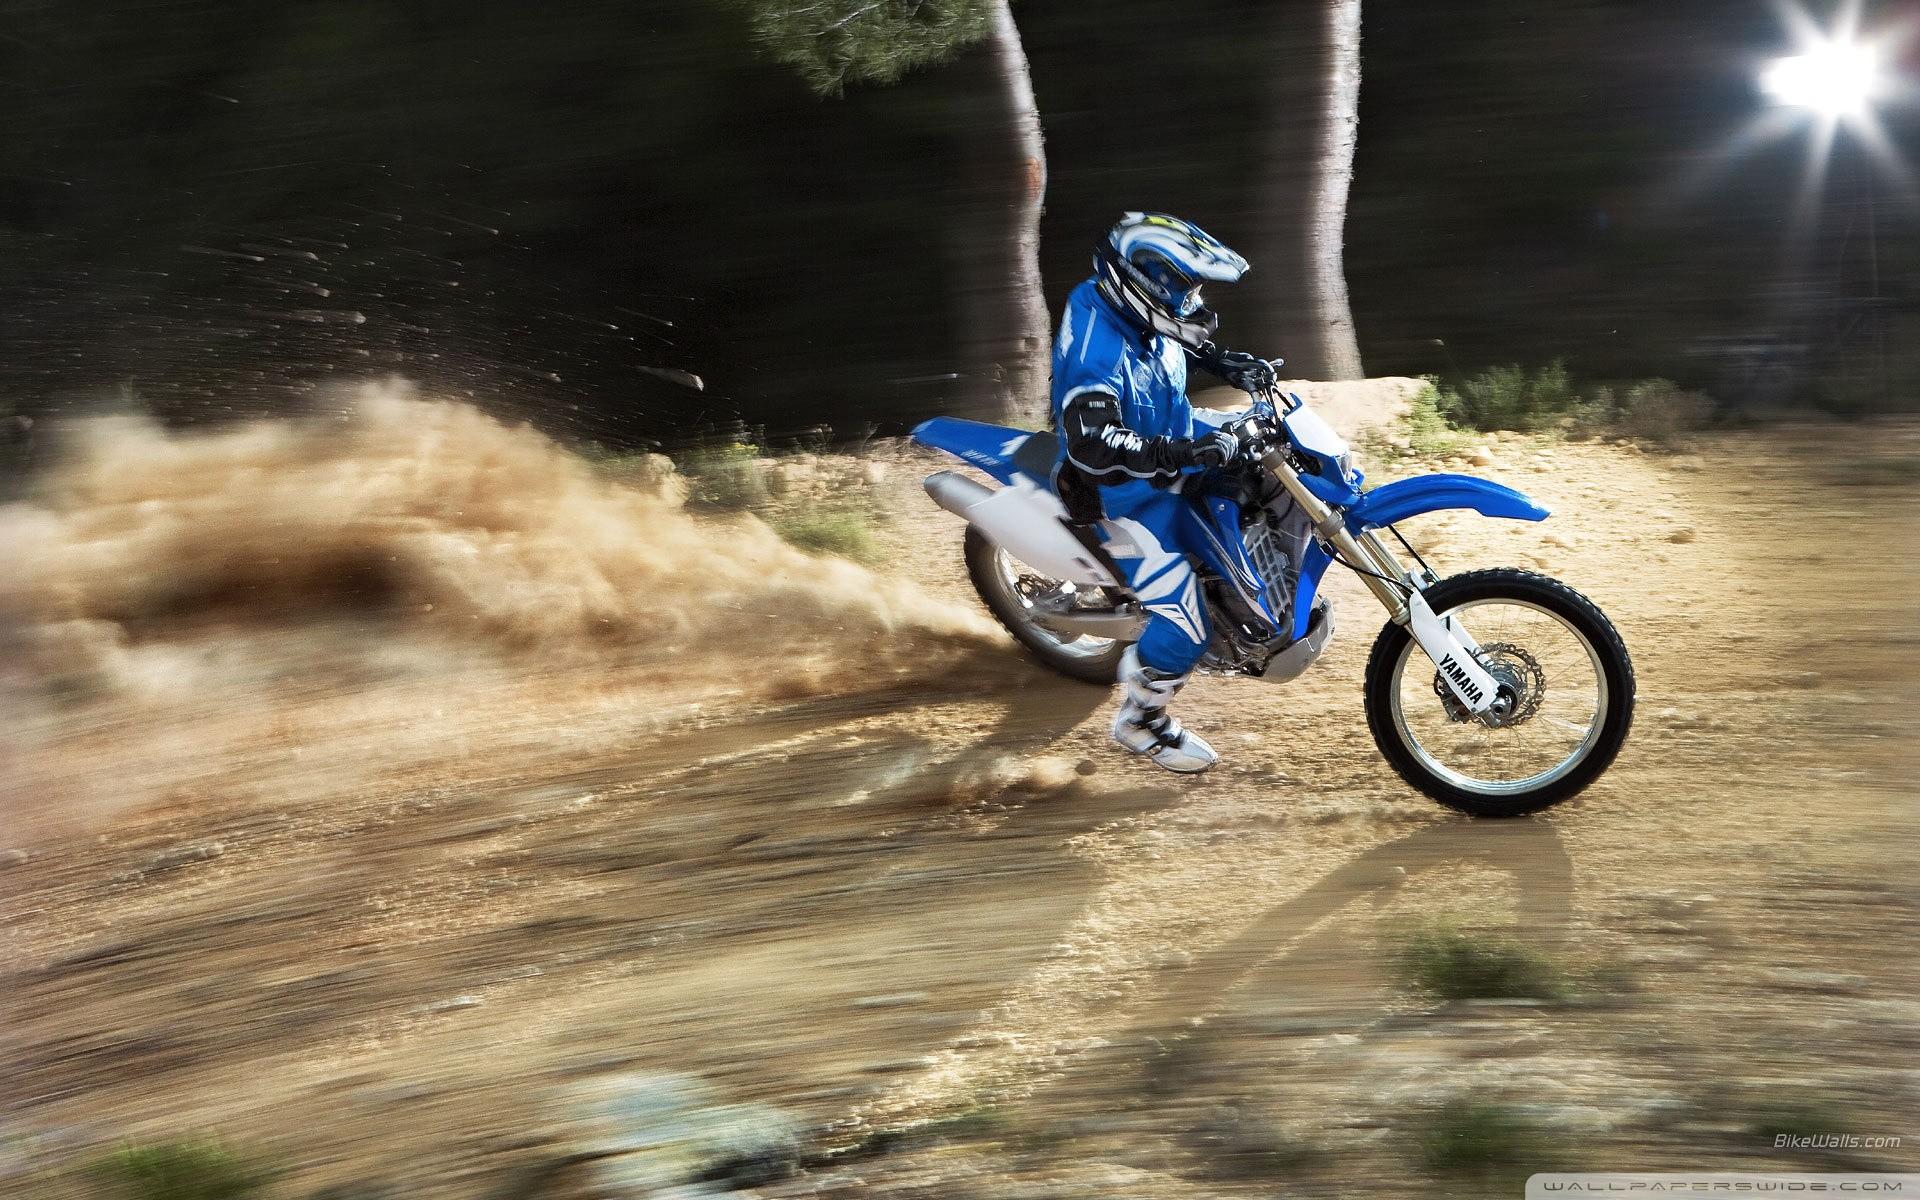 High Quality Motocross HD Wallpaper Full HD Pictures 1920×1200 Motocross  Wallpapers (39 Wallpapers